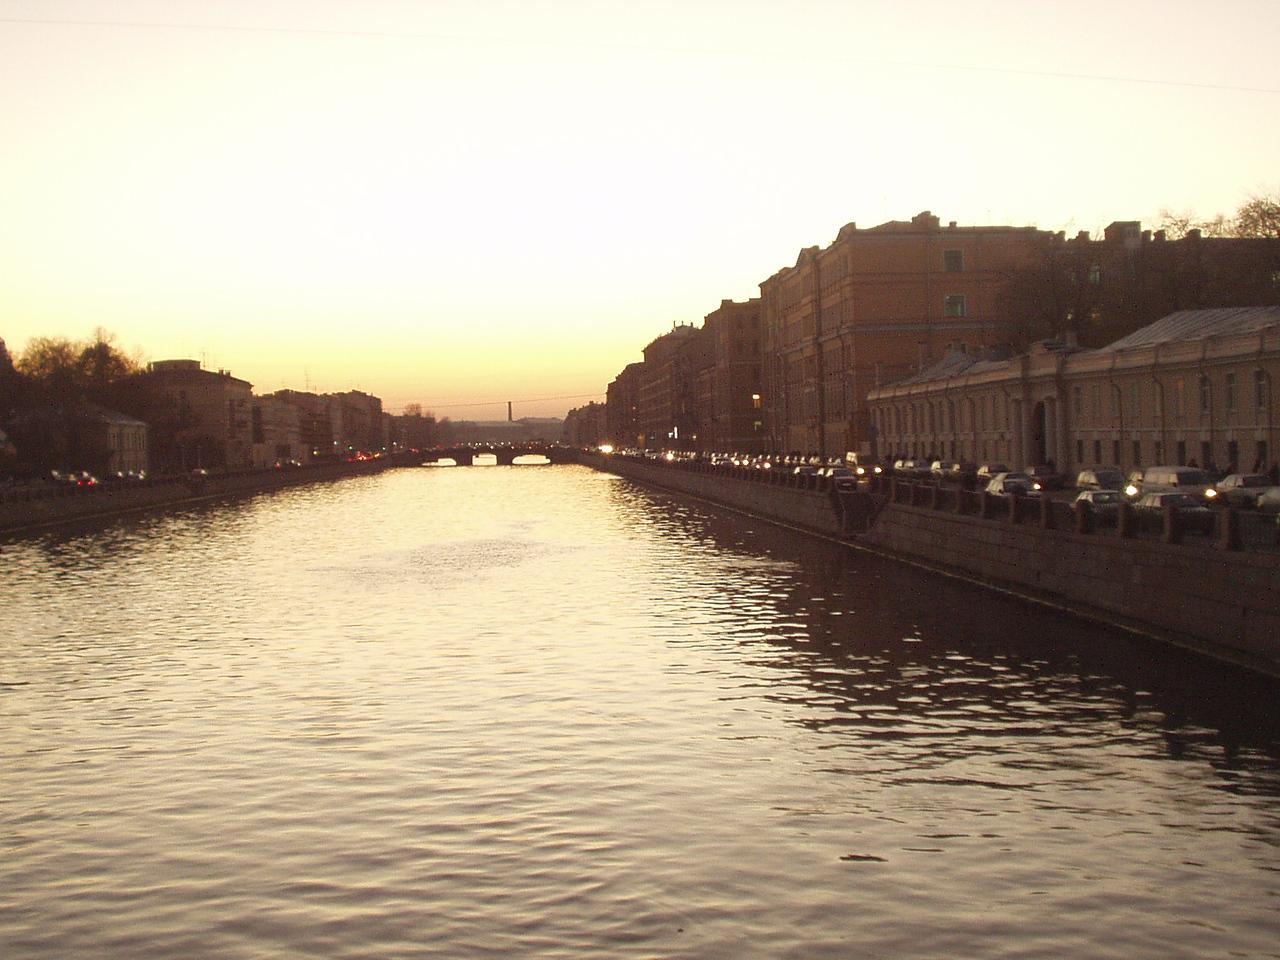 canals04.jpg